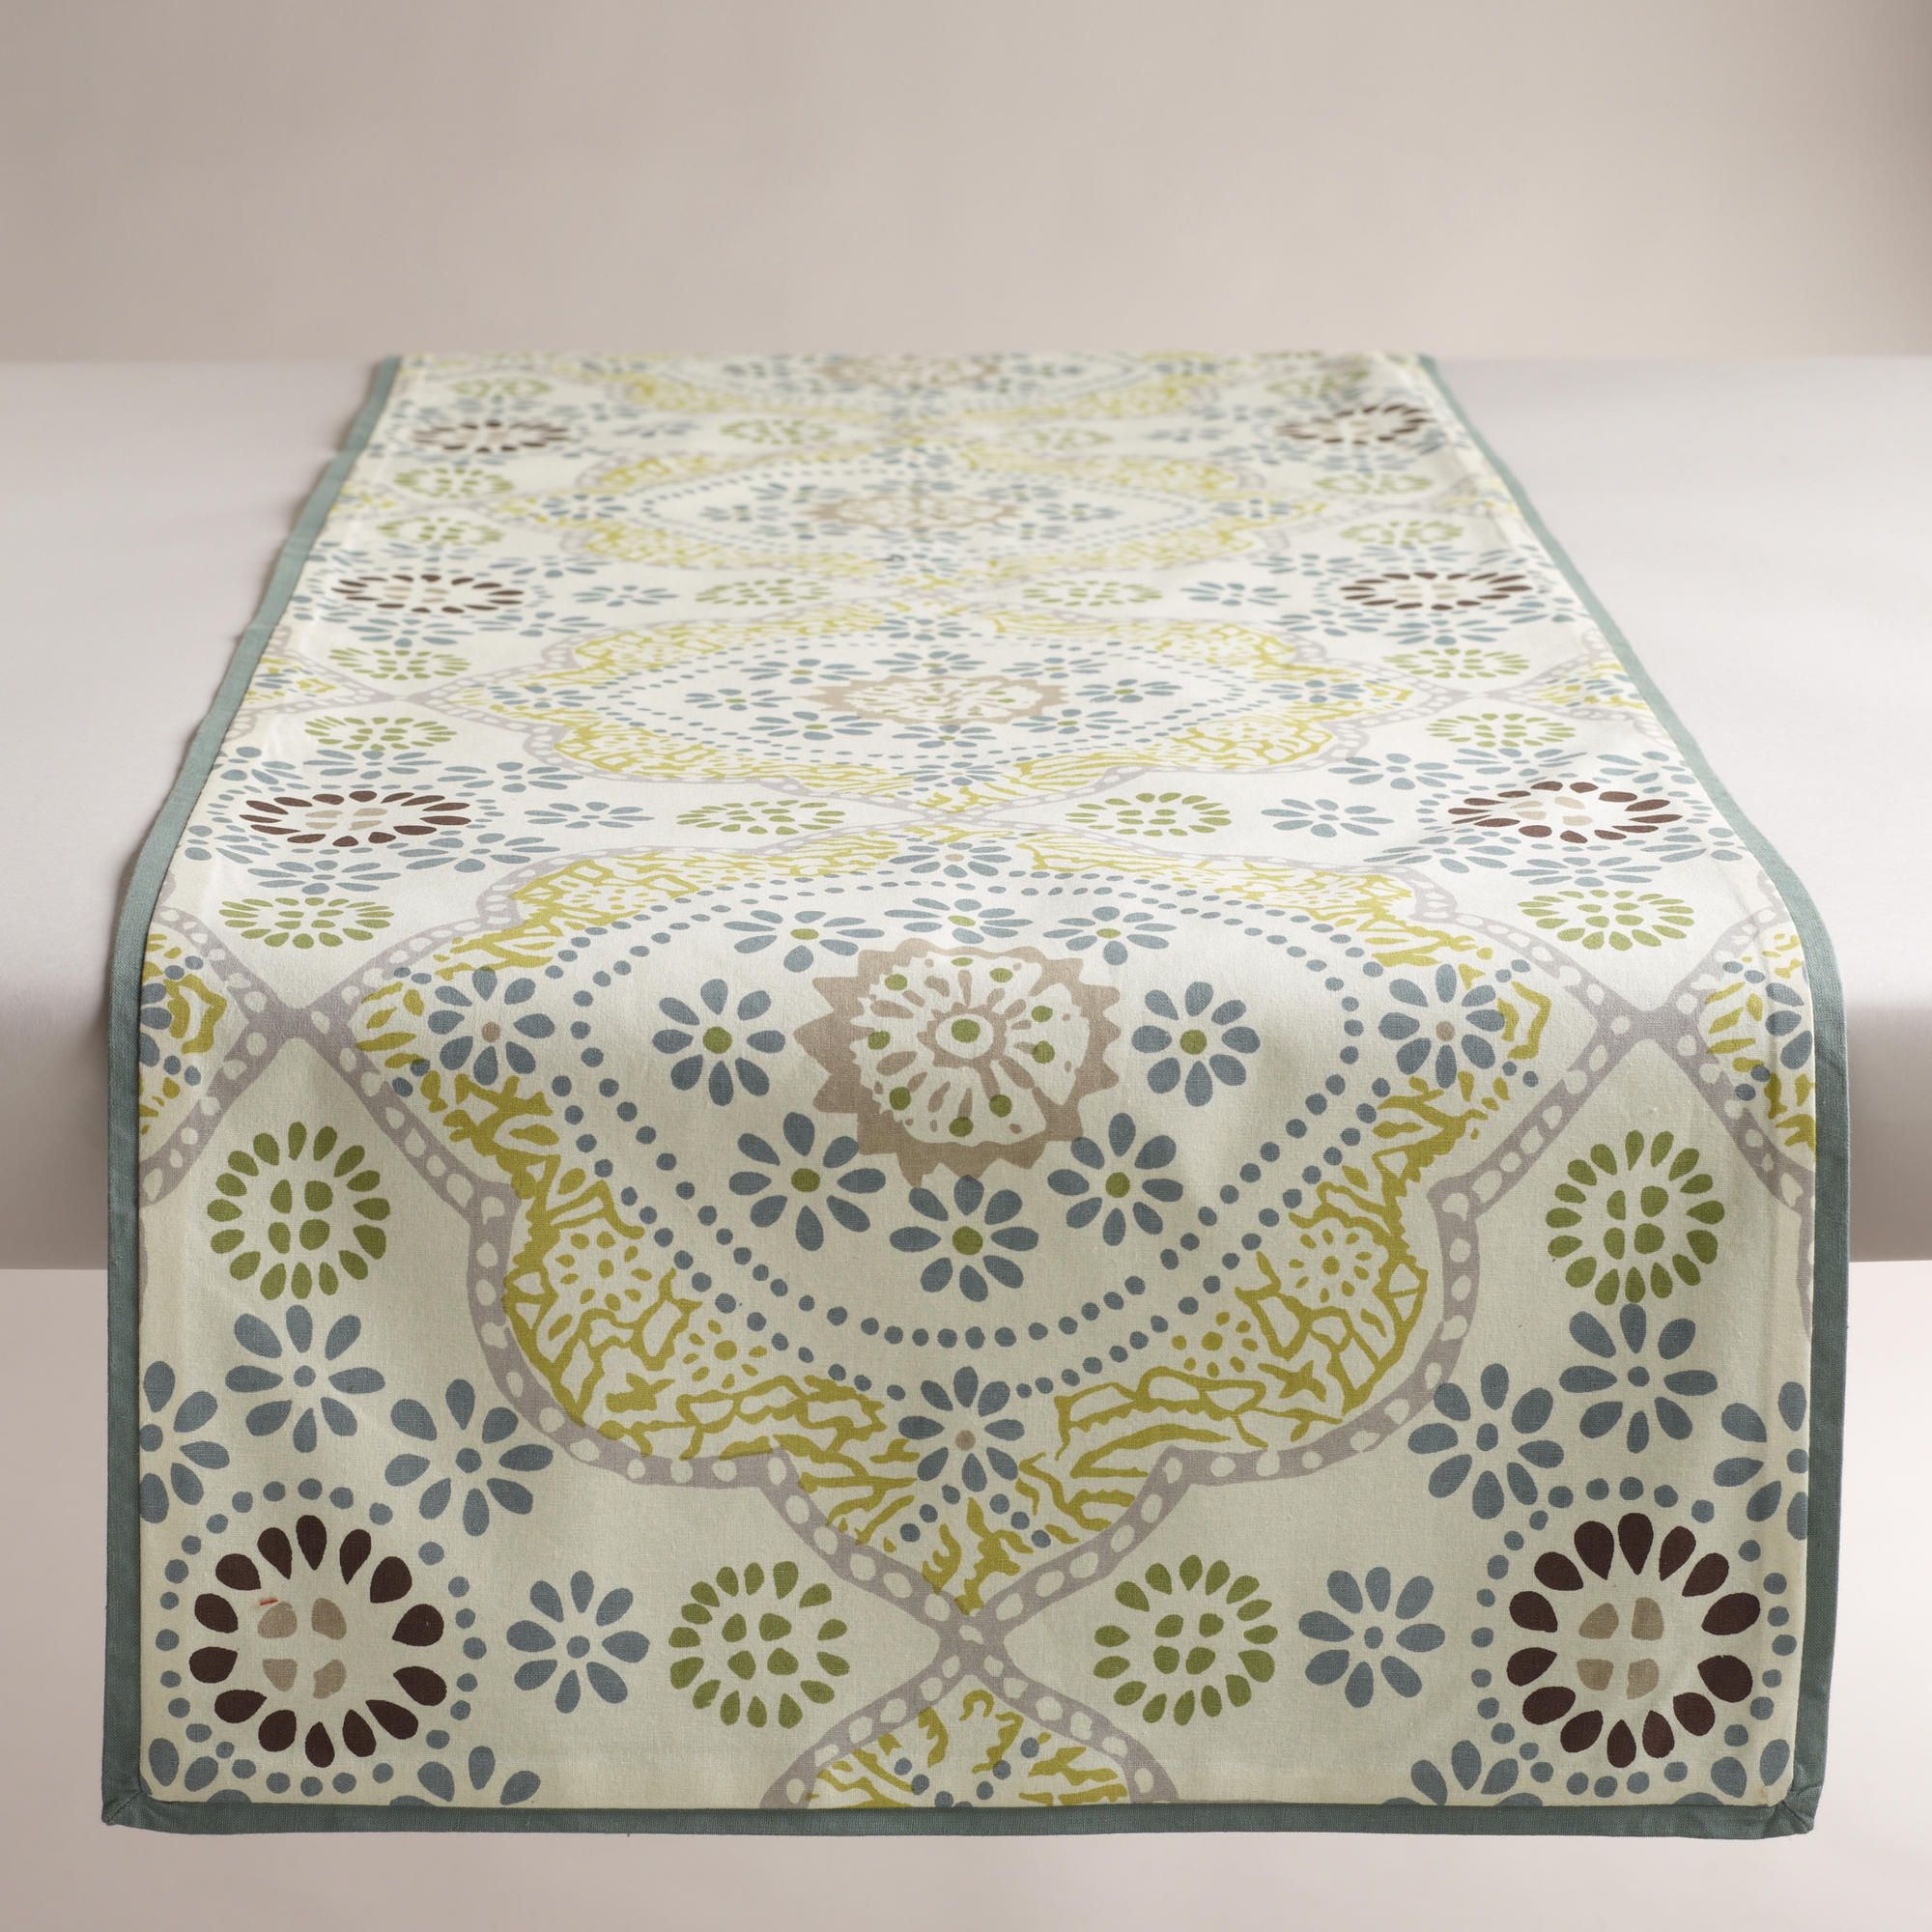 Mosaic Tile Table Runner World Market Mosaic Tile Table Tile Tables Mosaic Tiles